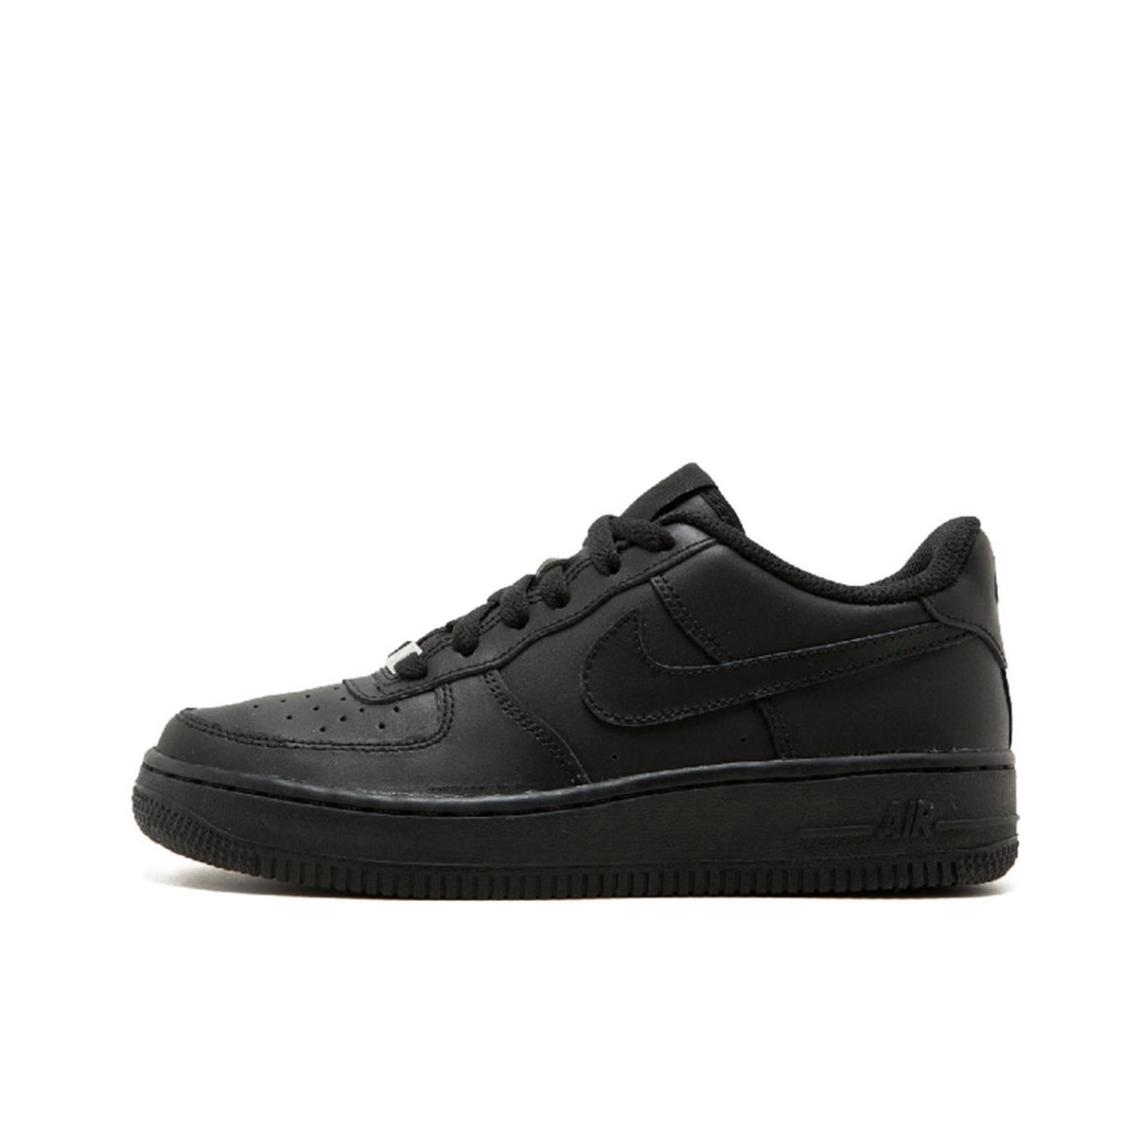 Nike Air Force 1 Low Black 纯黑色 实付到手749元